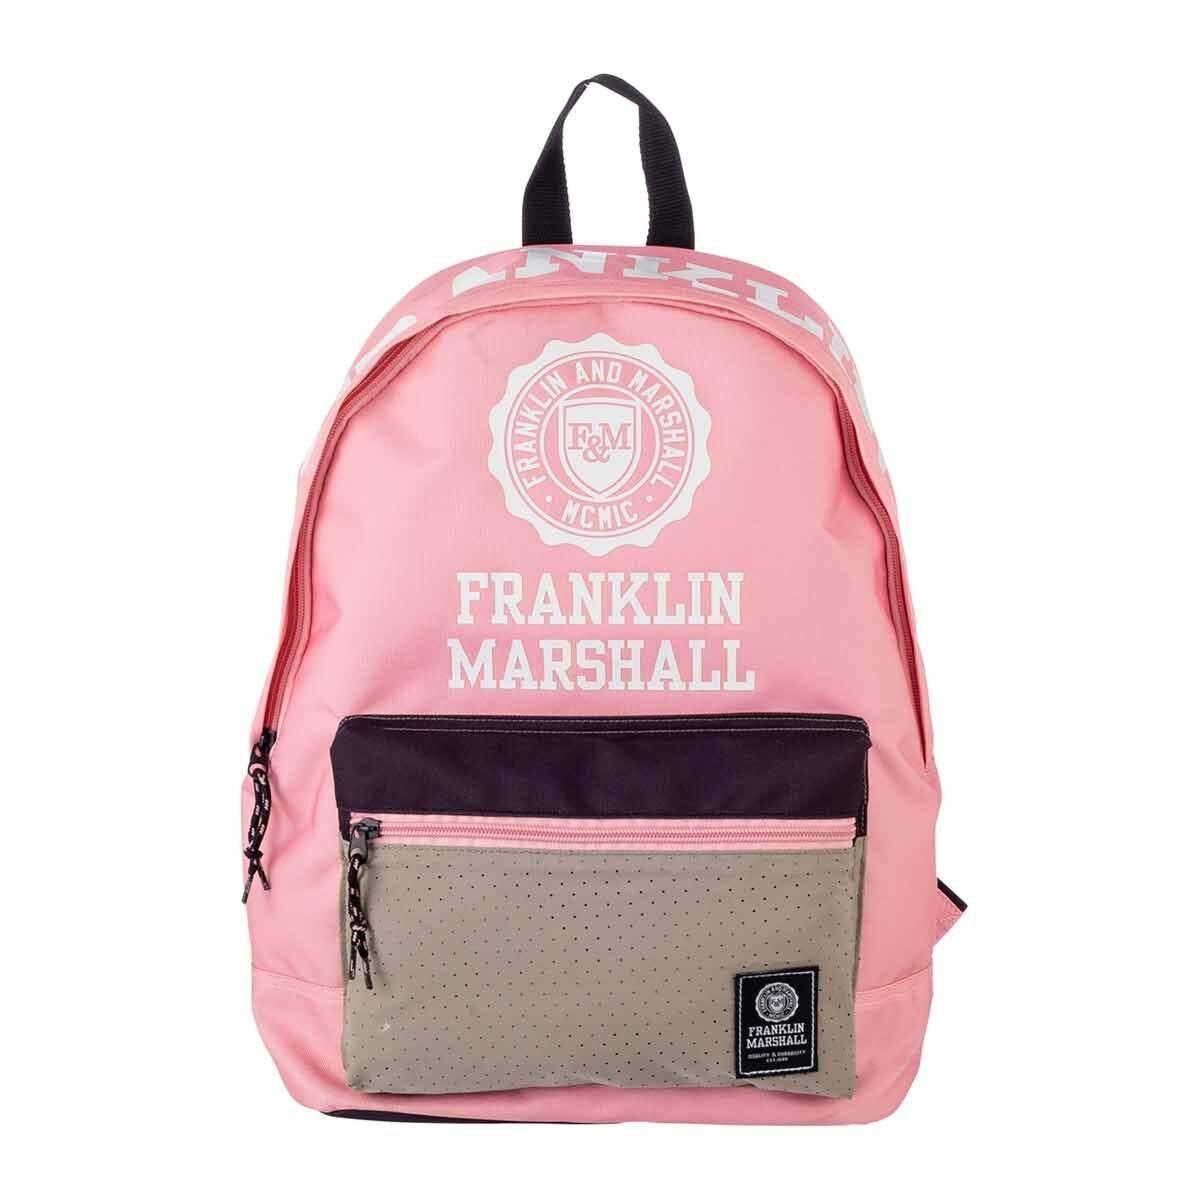 Franklin Marshall Backpack